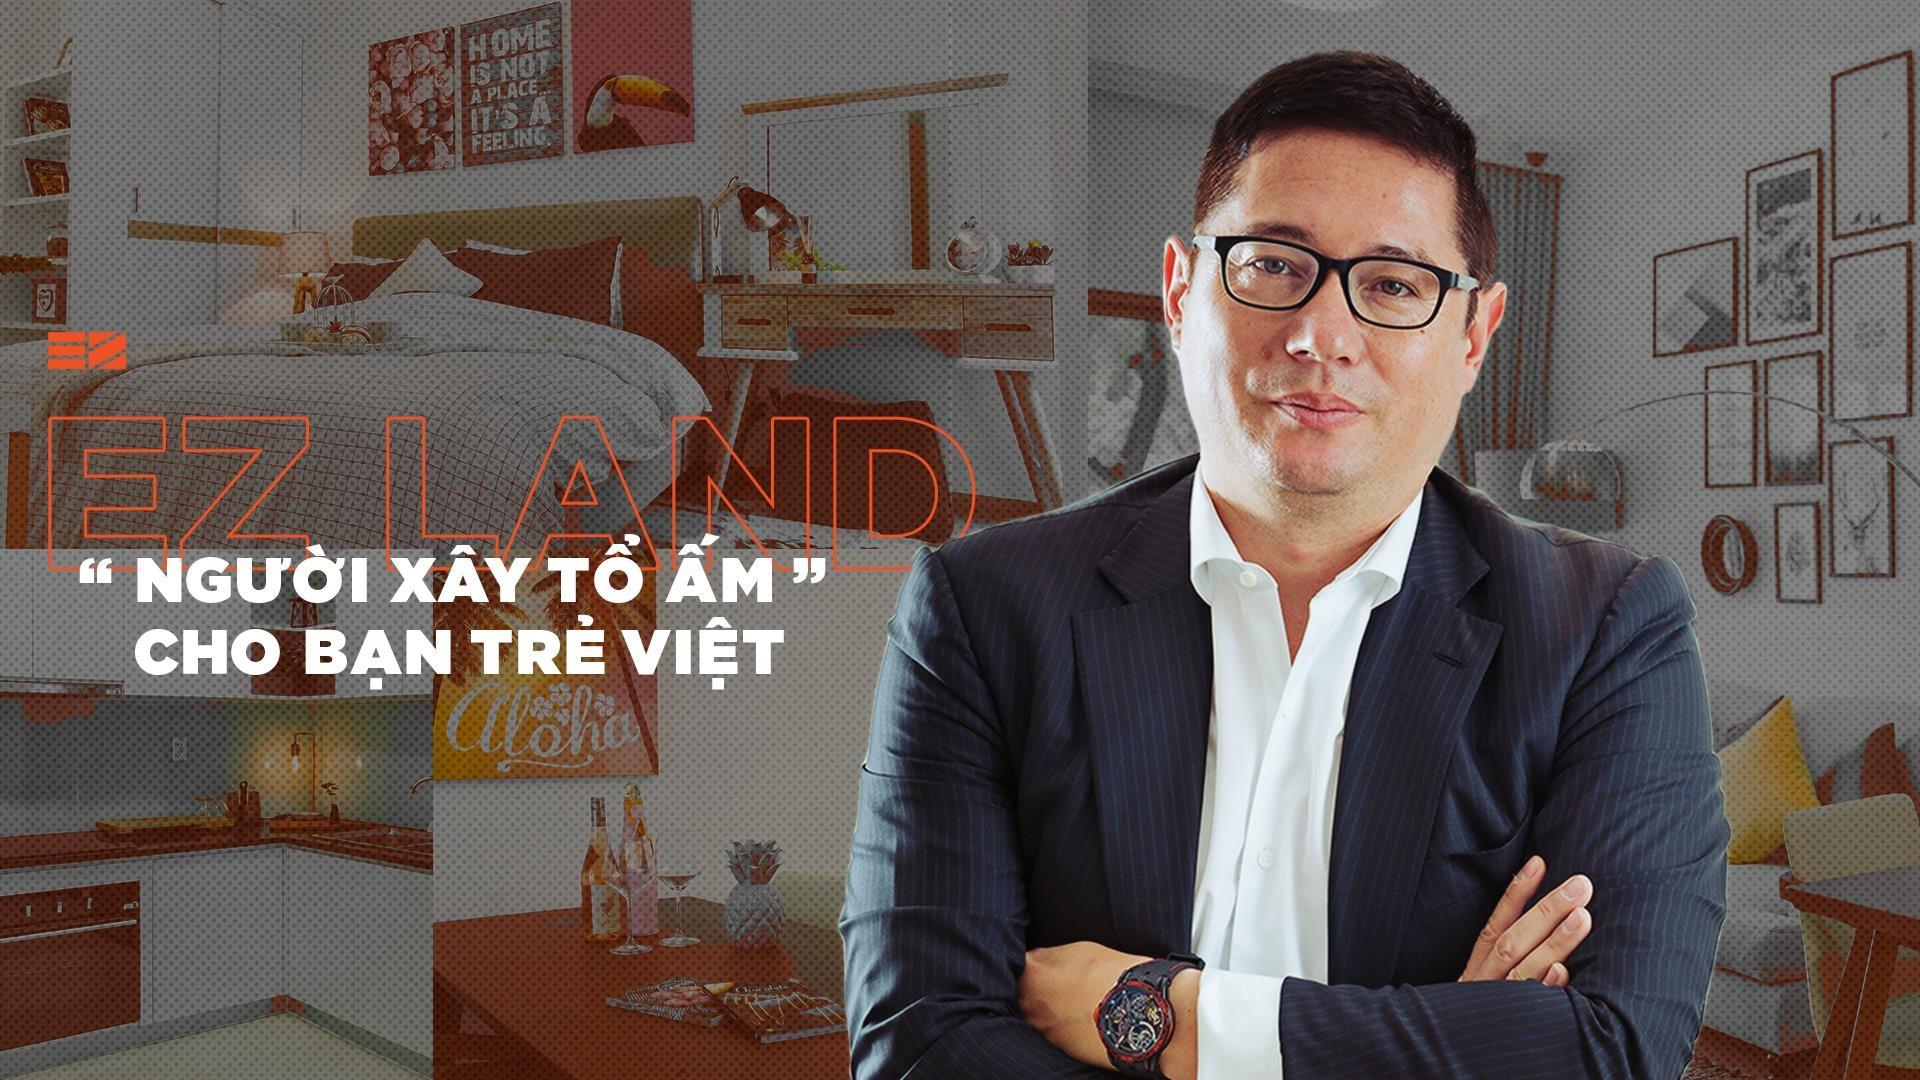 EZ Land: 'Nguoi xay to am' cho ban tre Viet hinh anh 2